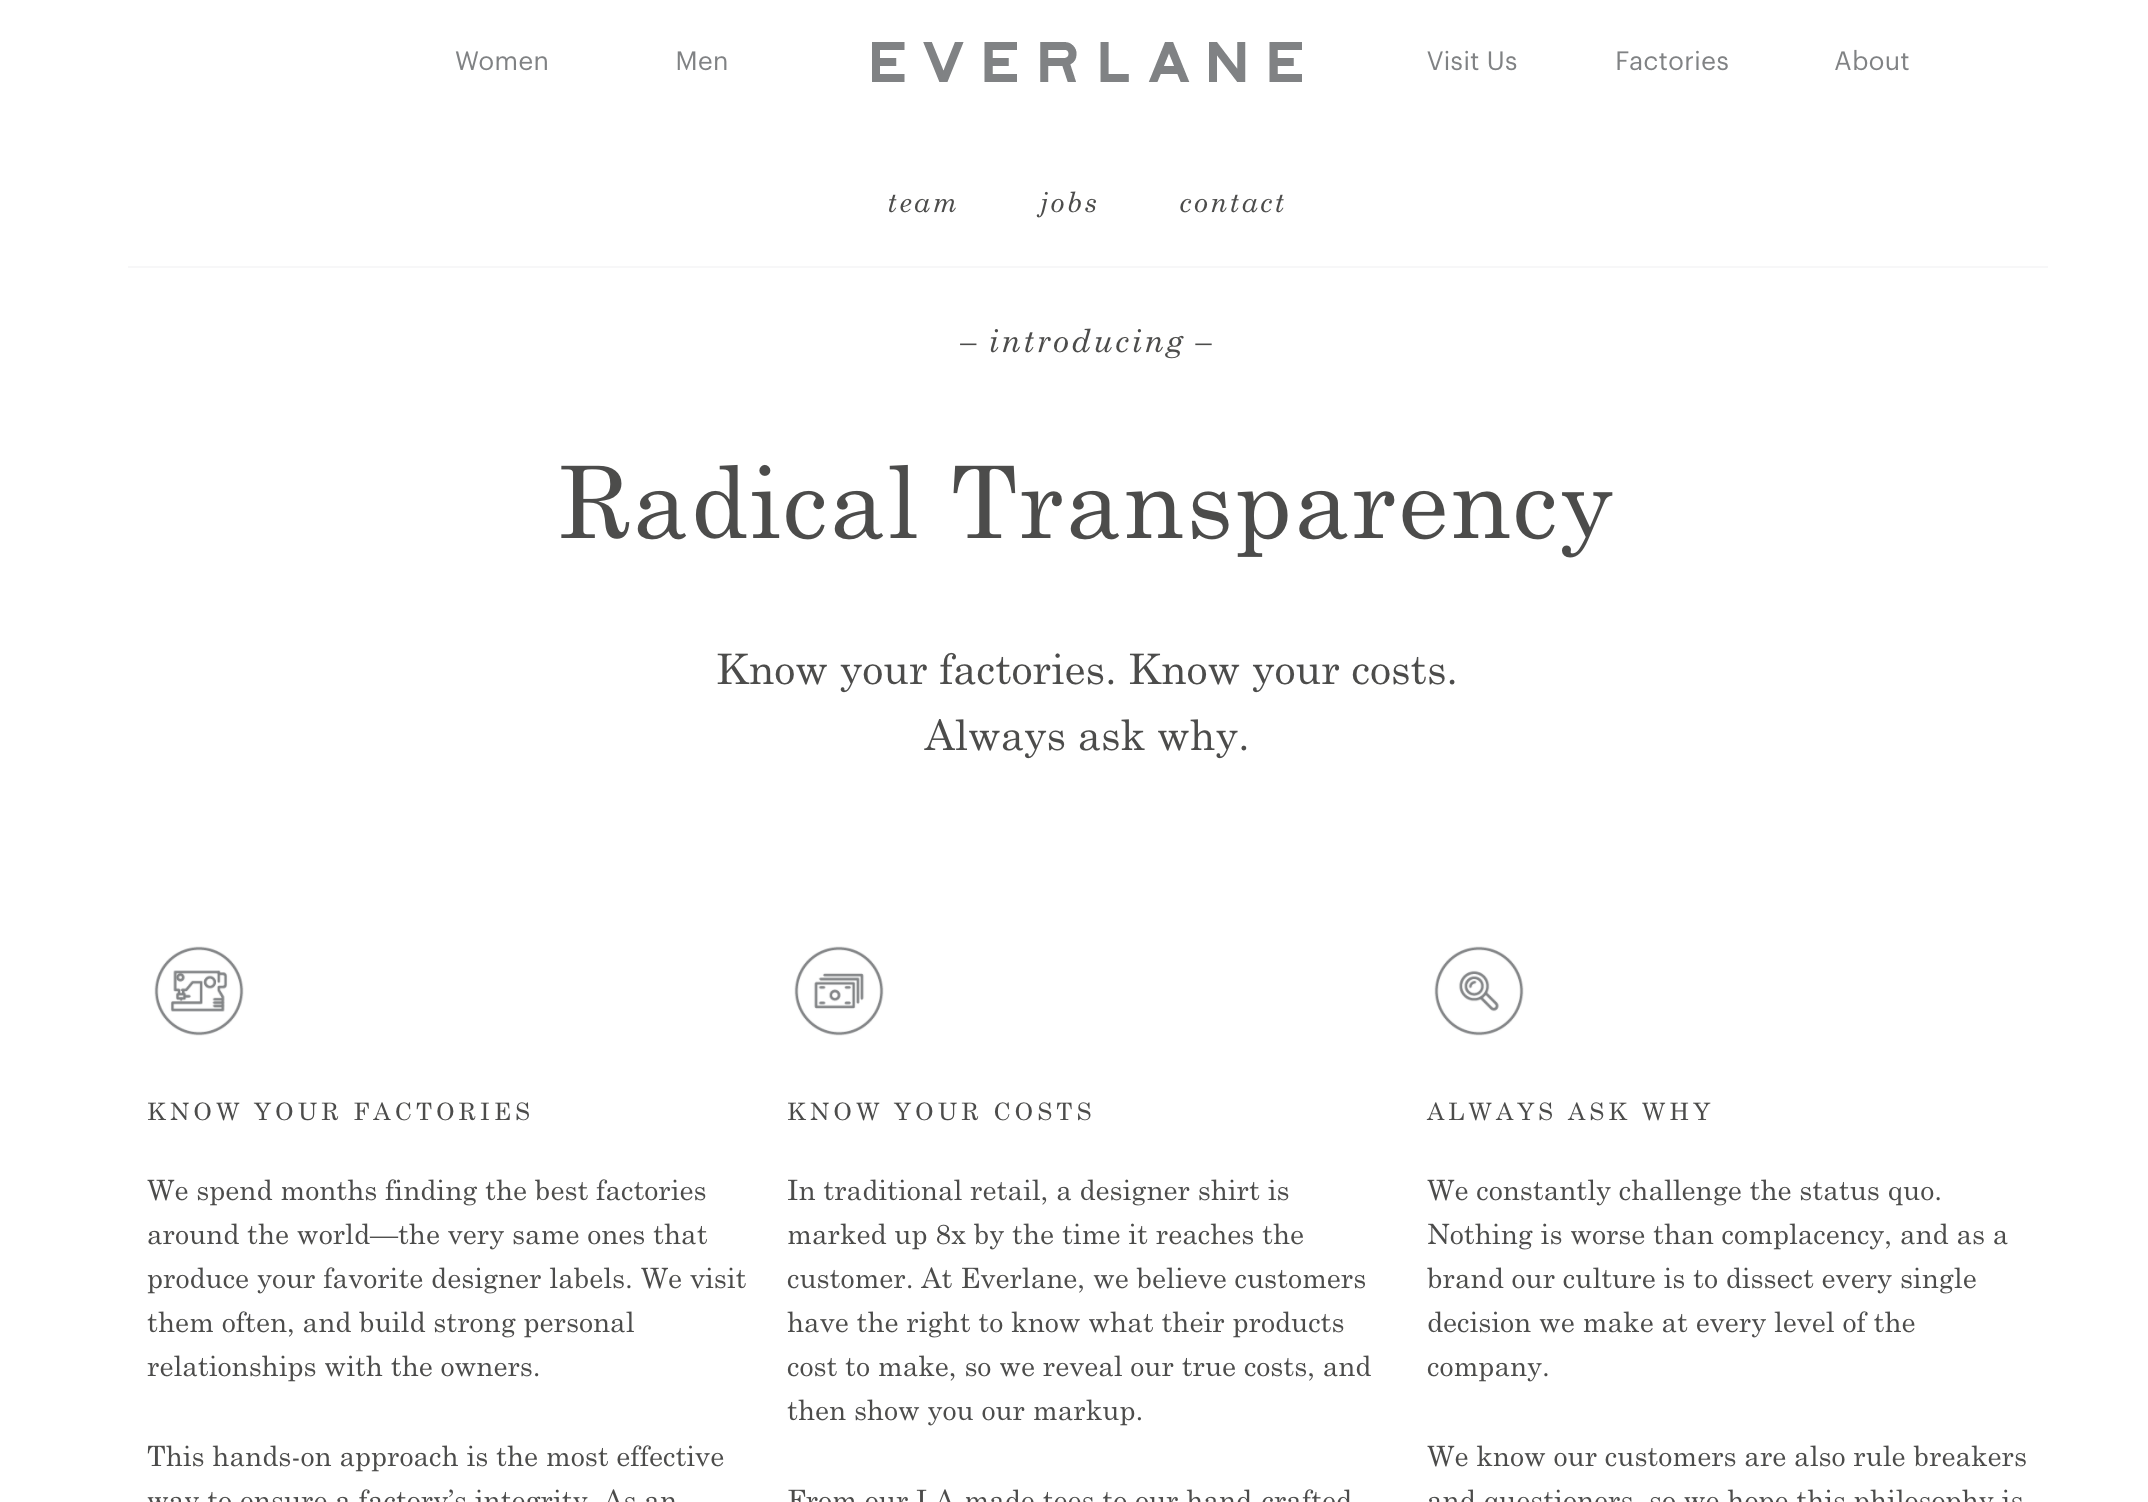 Everlane Manifesto example.png